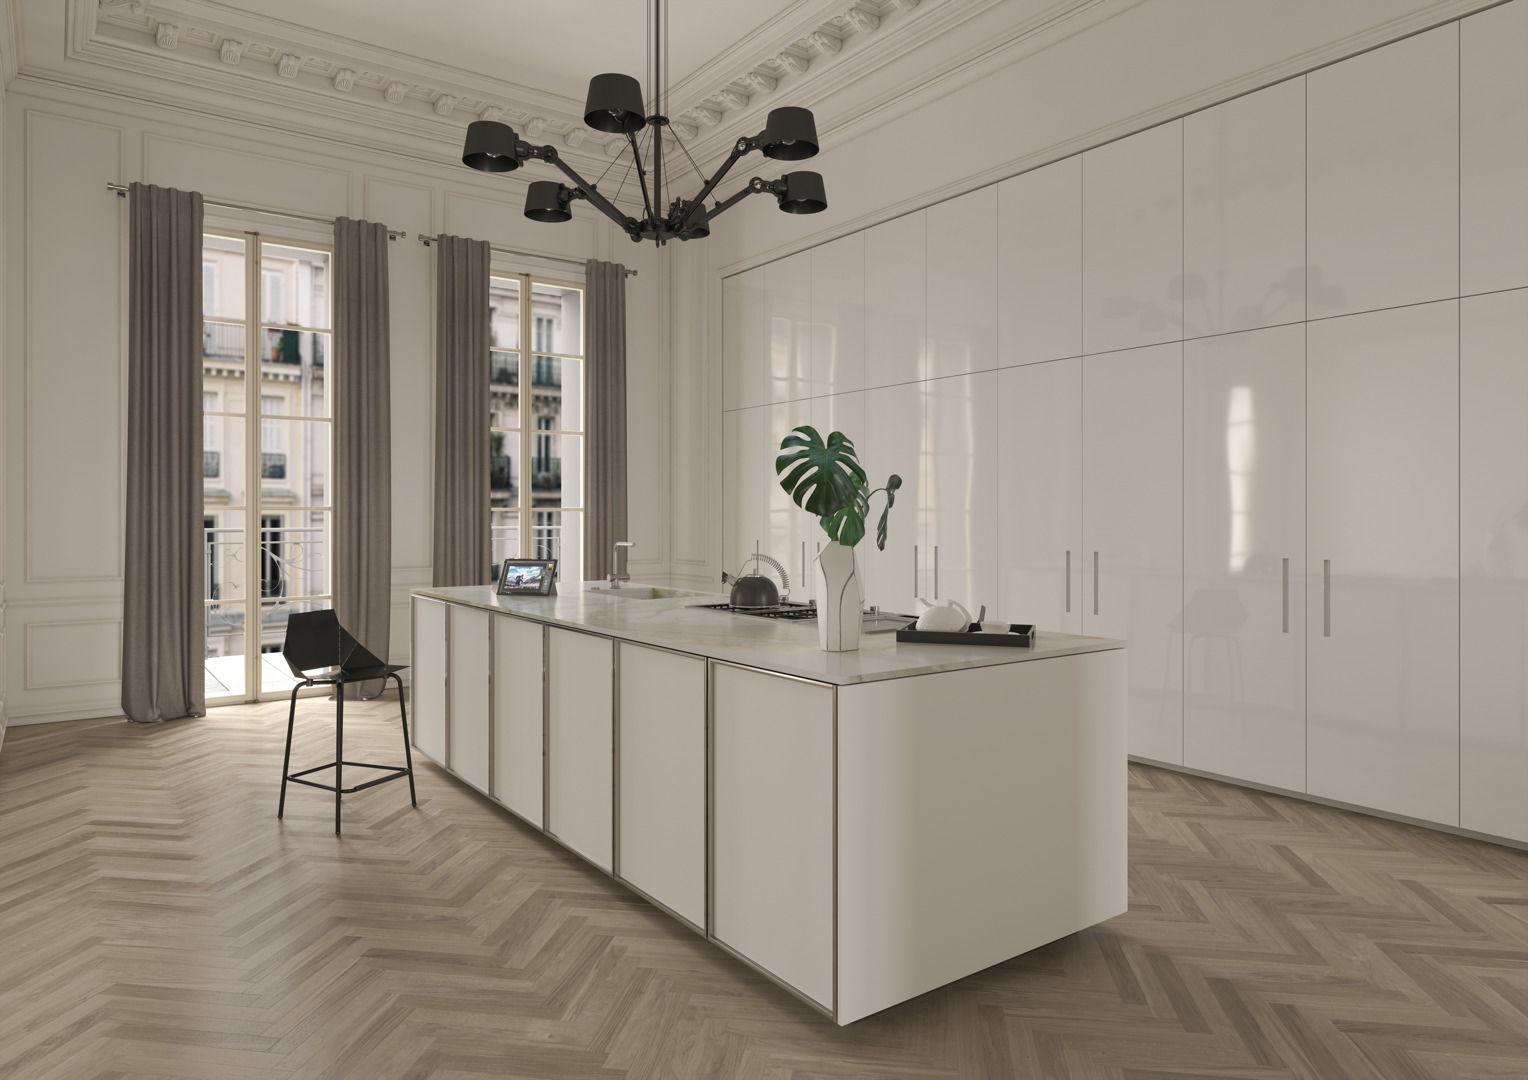 Cucina moderna / in acciaio inox / impiallacciata in legno / a ...